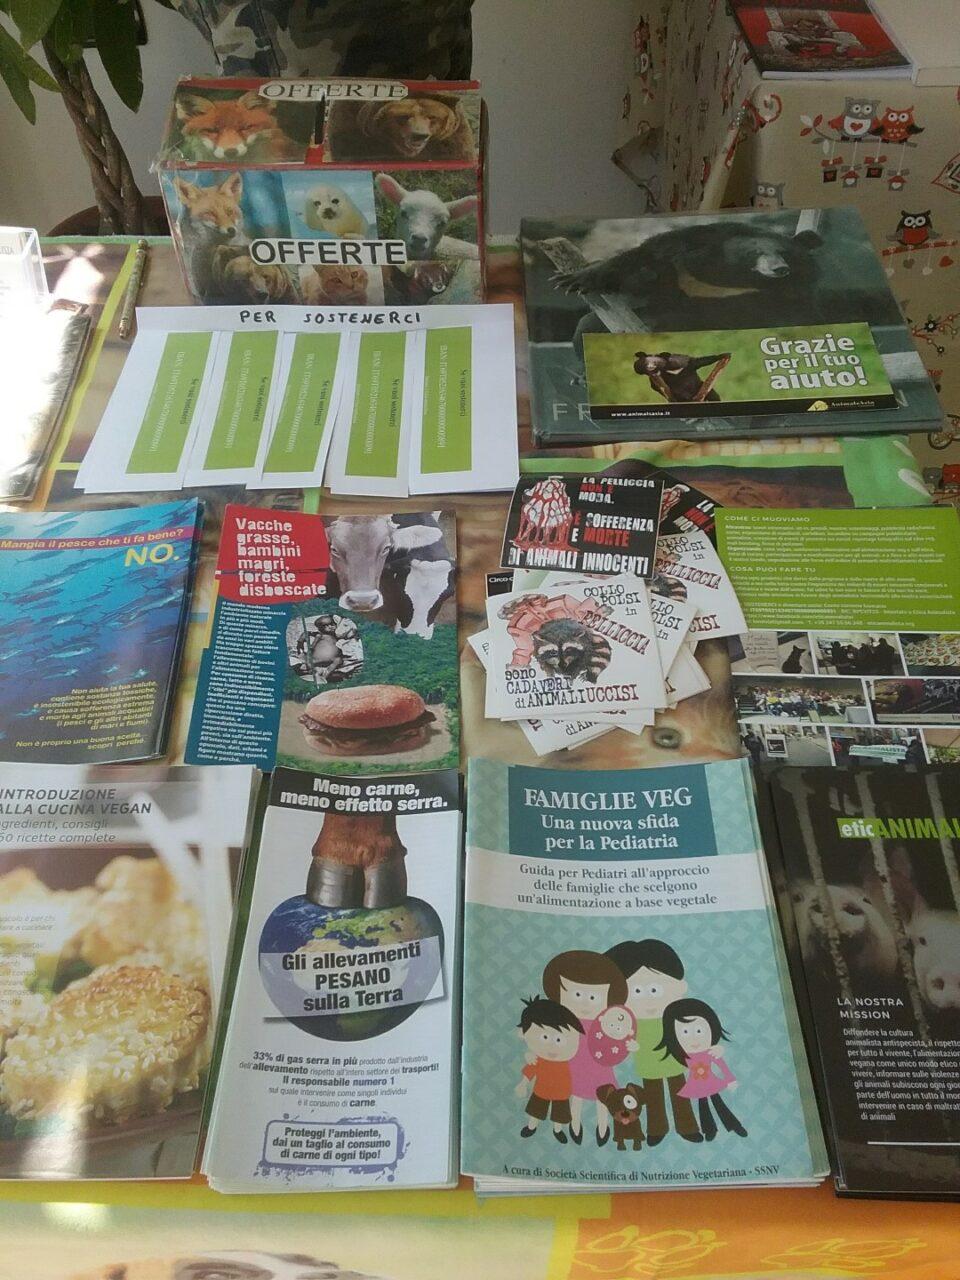 Eticanimalista c/o Black Sheep pasticceria bio vegan - gelati veg 2017 e informazione vegan - 08.04.2017 25